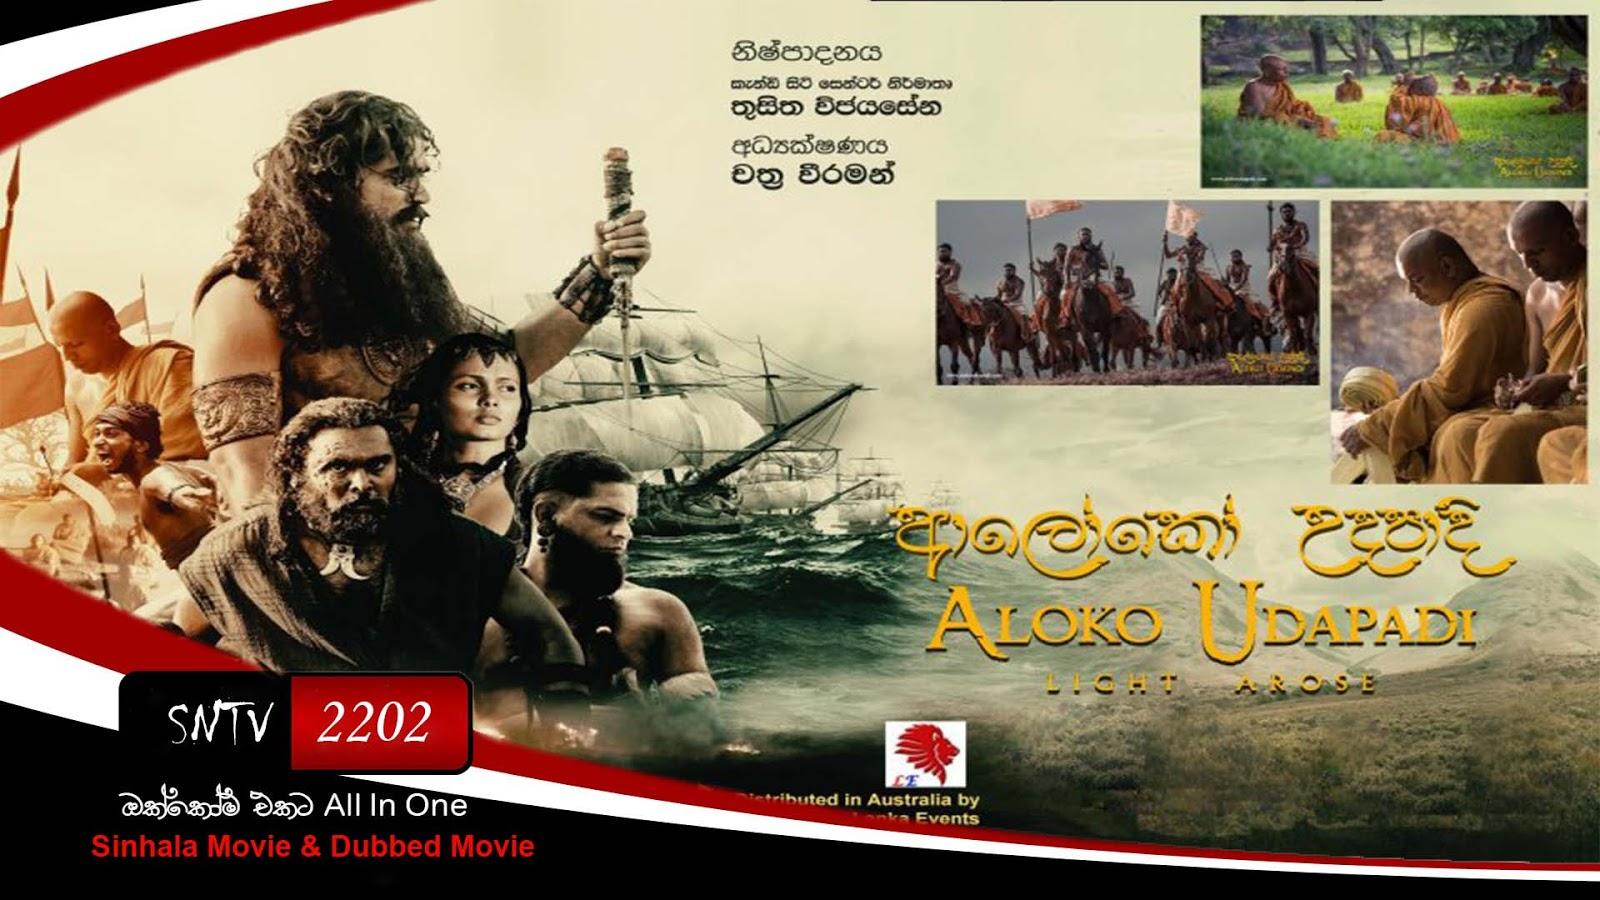 Free Online Sinhala Movies. Aloko Udapadi (Light Arose) is